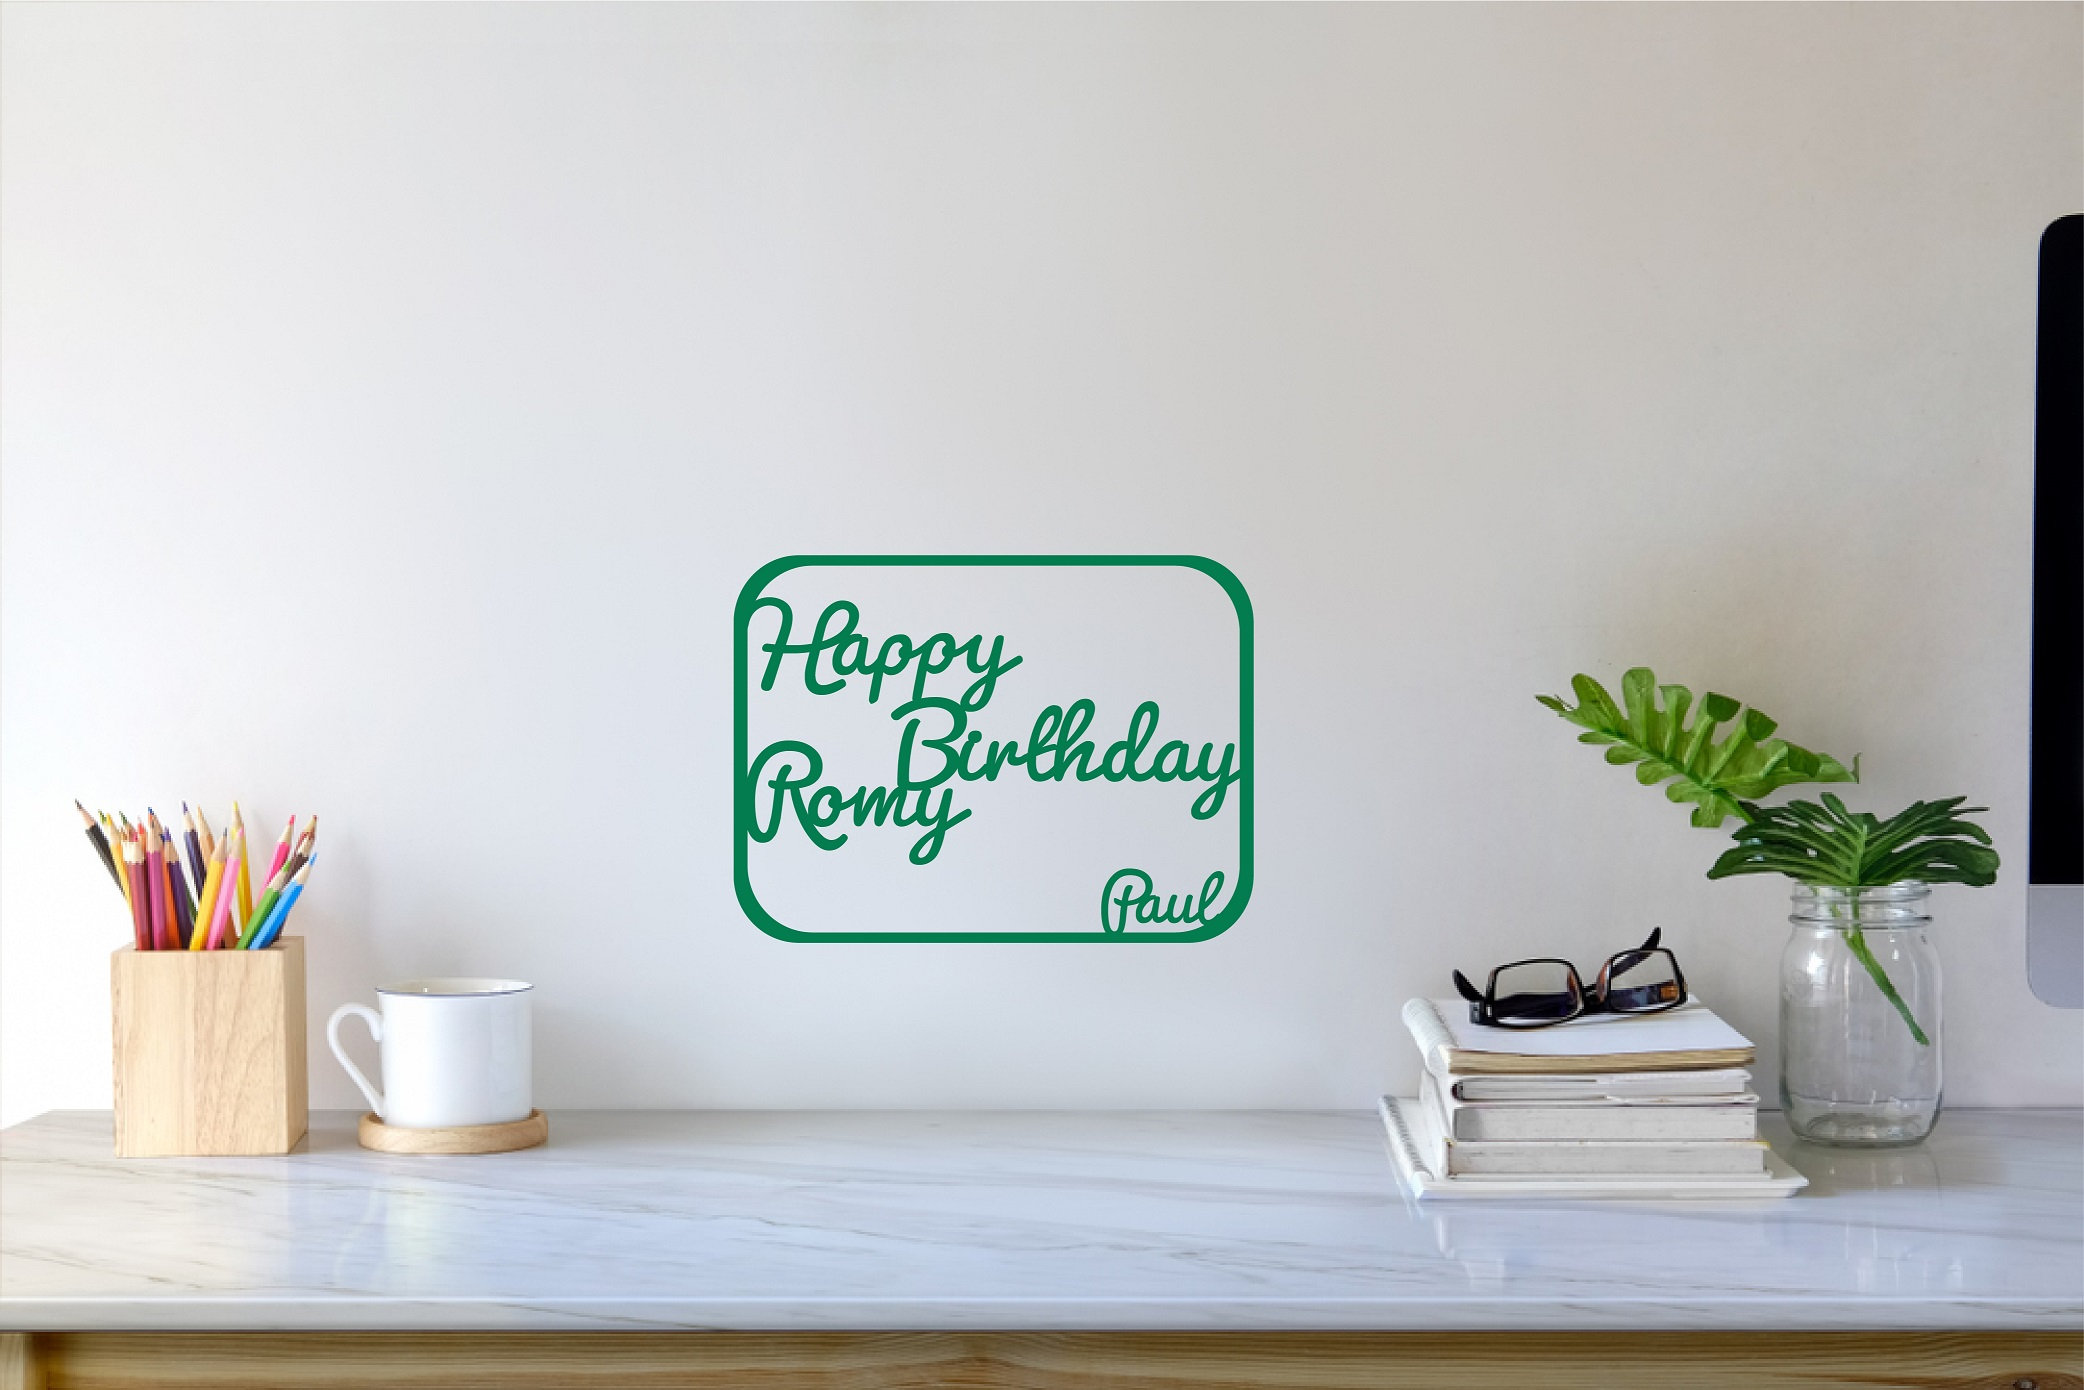 Happy Birthday + prénom à personnaliser